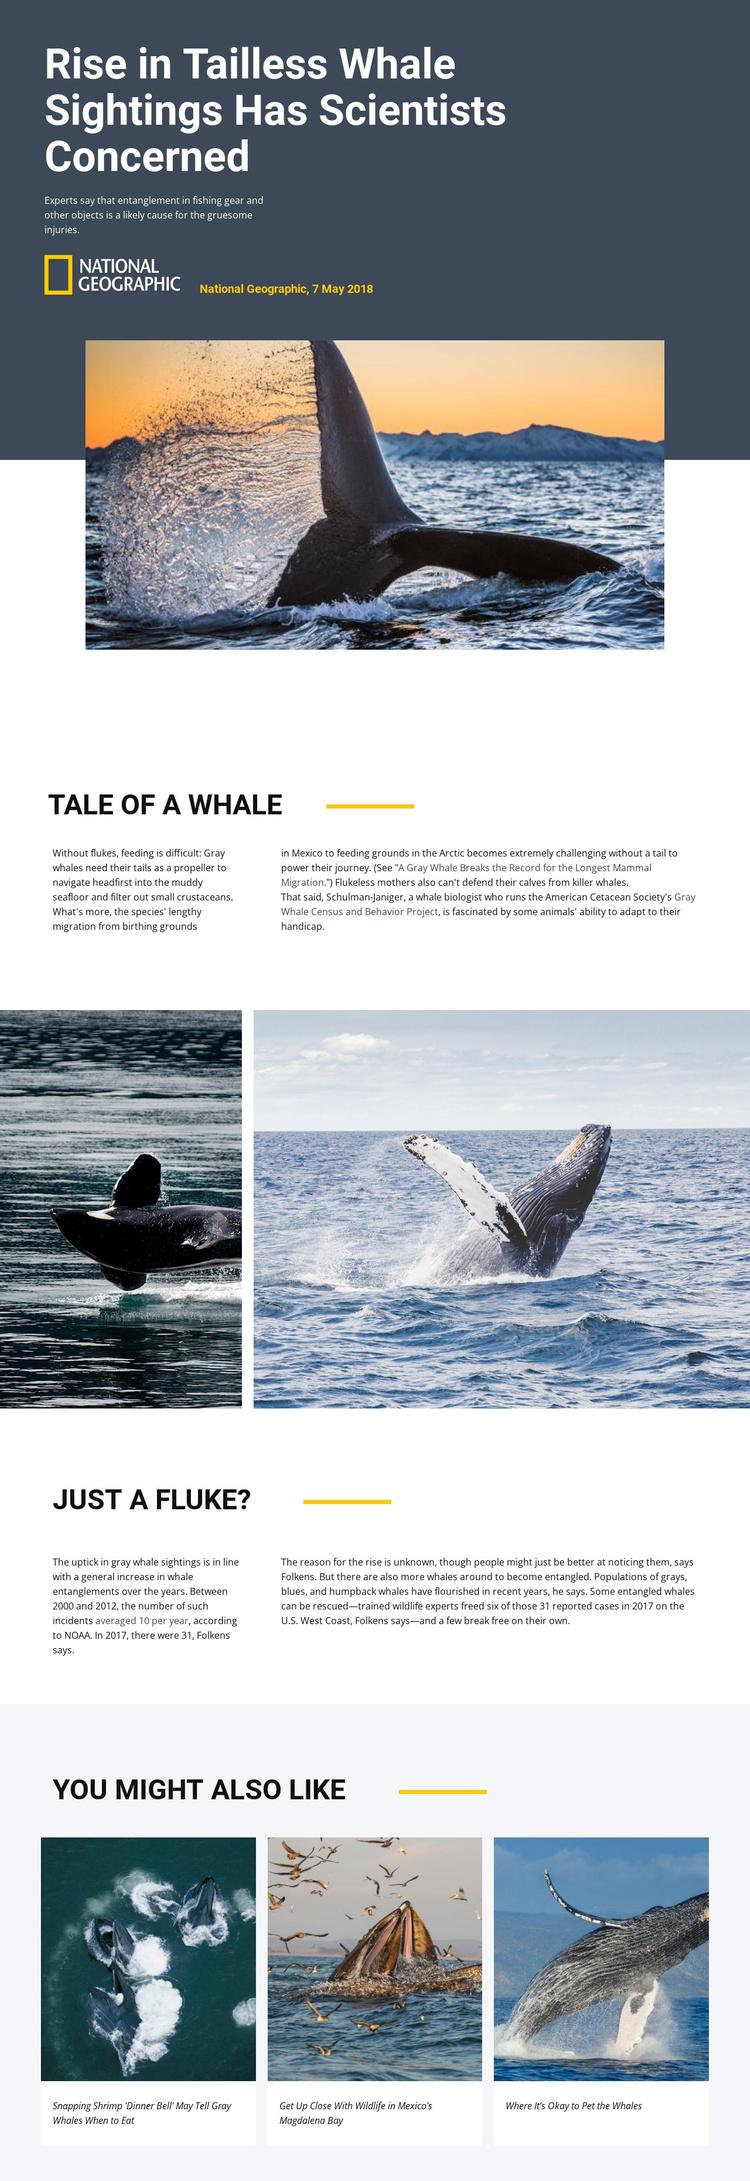 Whale watching center Joomla Template